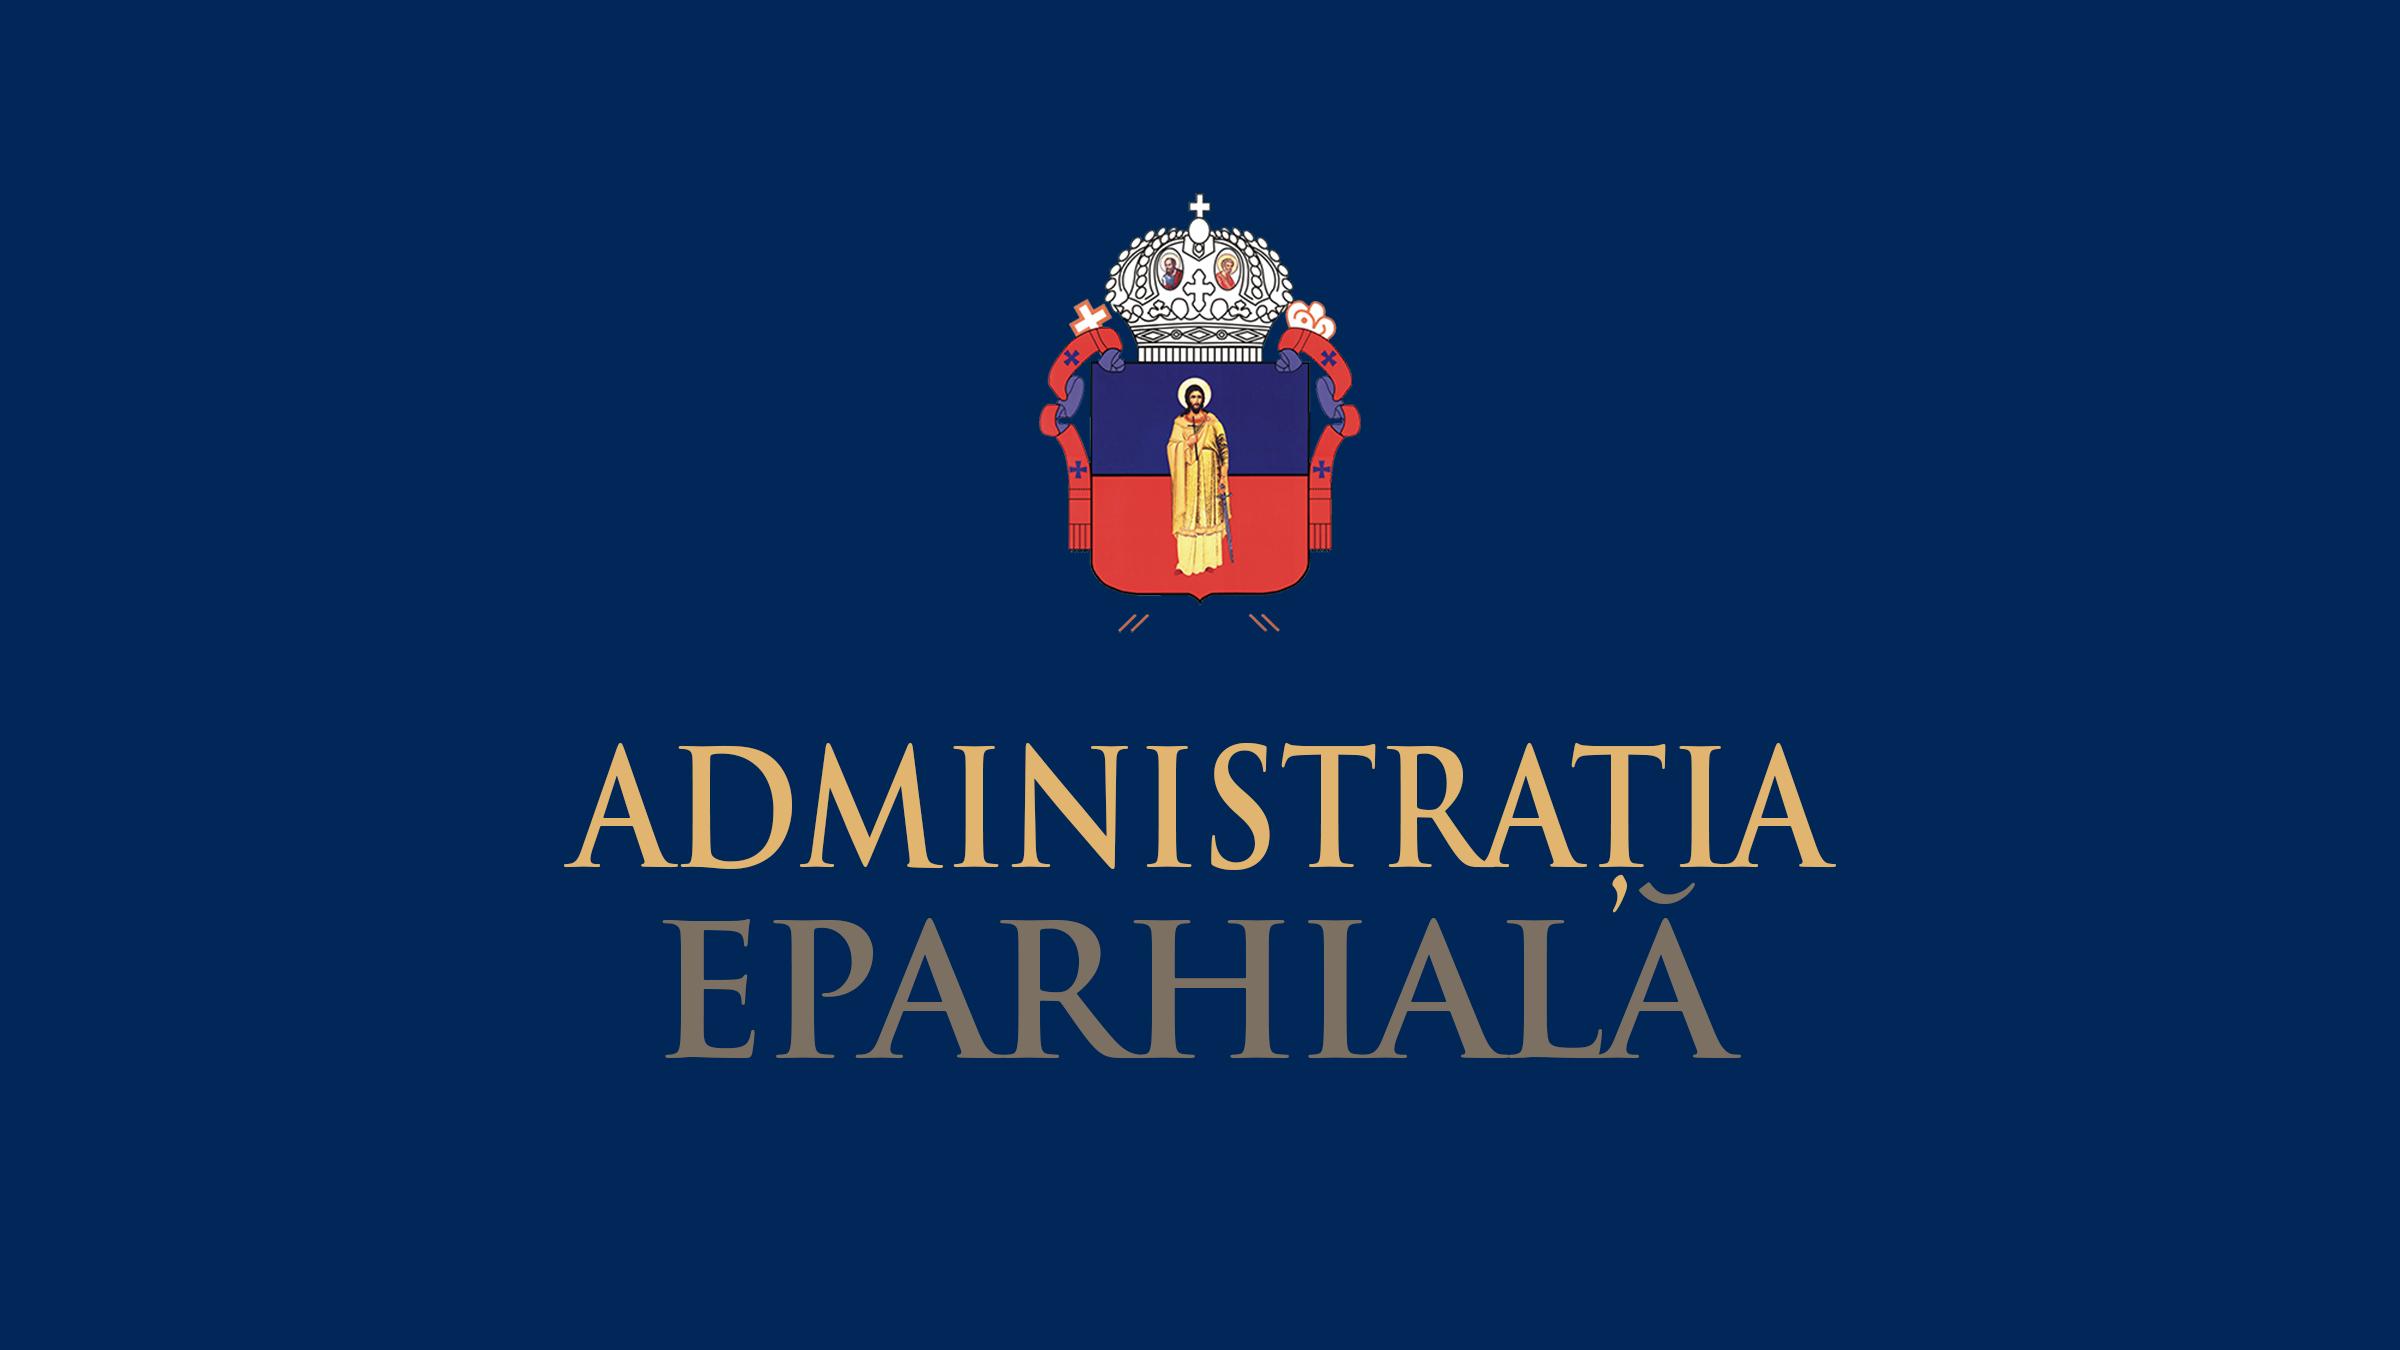 administratia_eparhiala